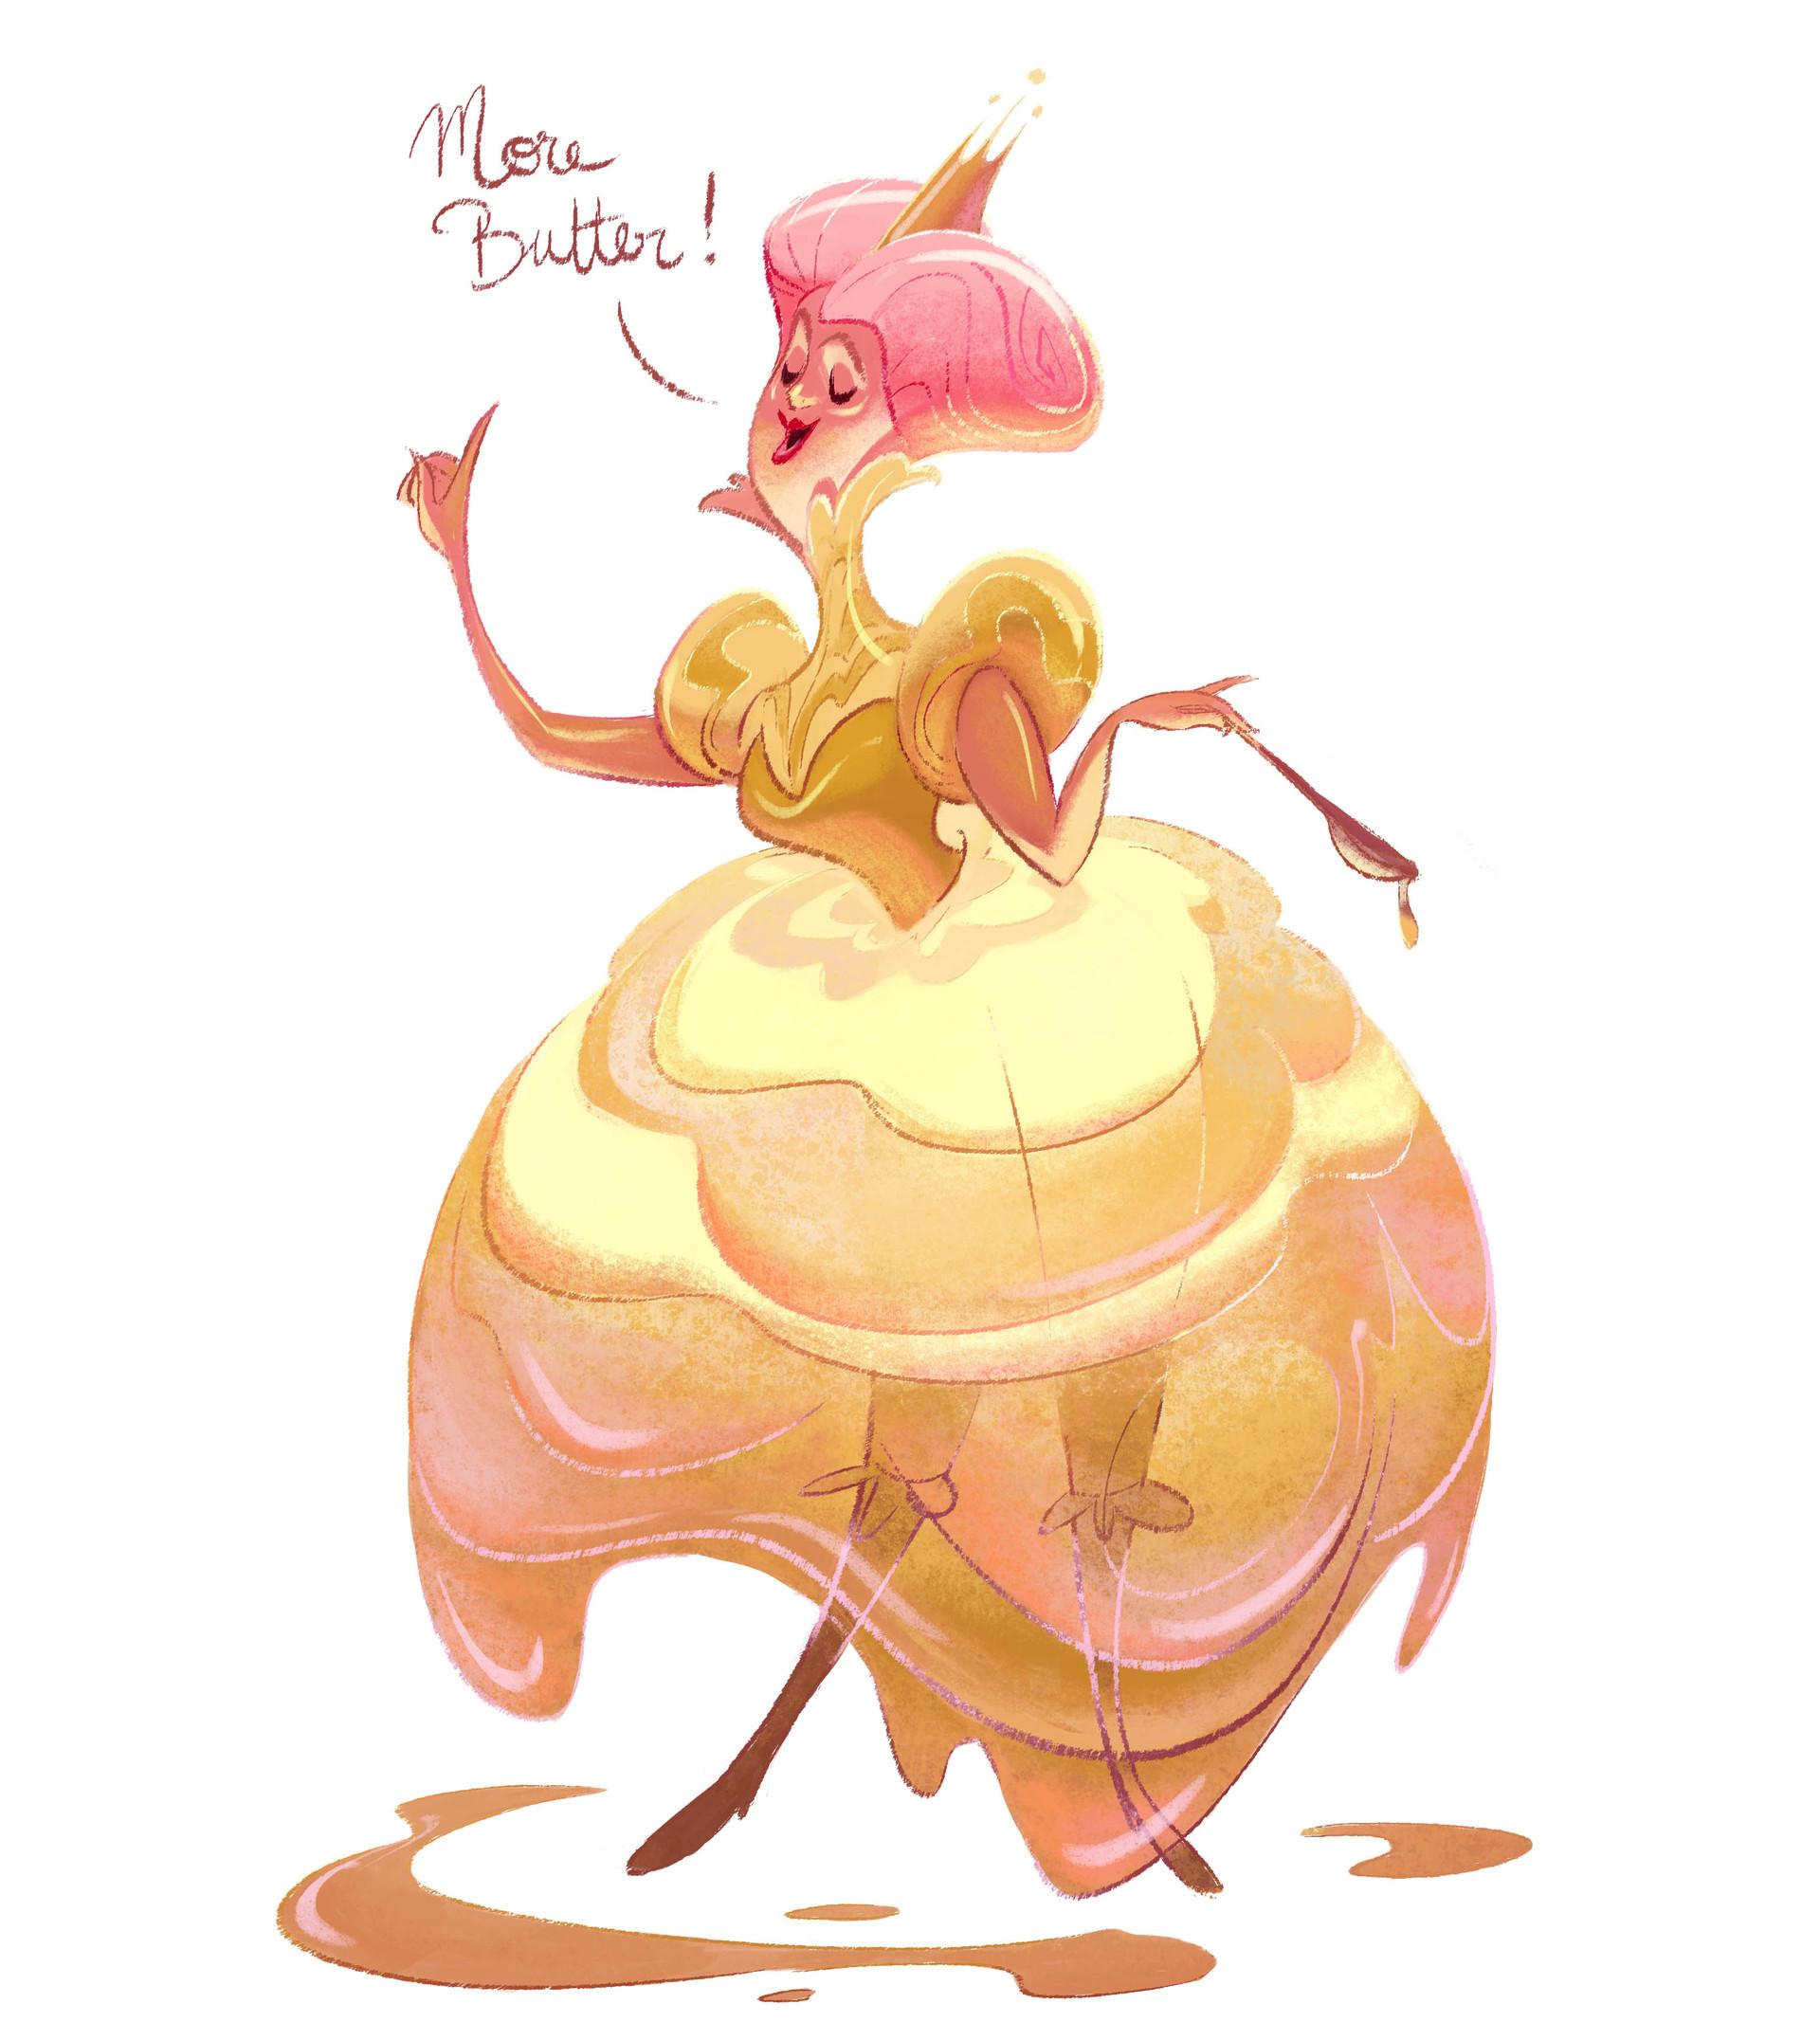 Cecile carre butterqueen1